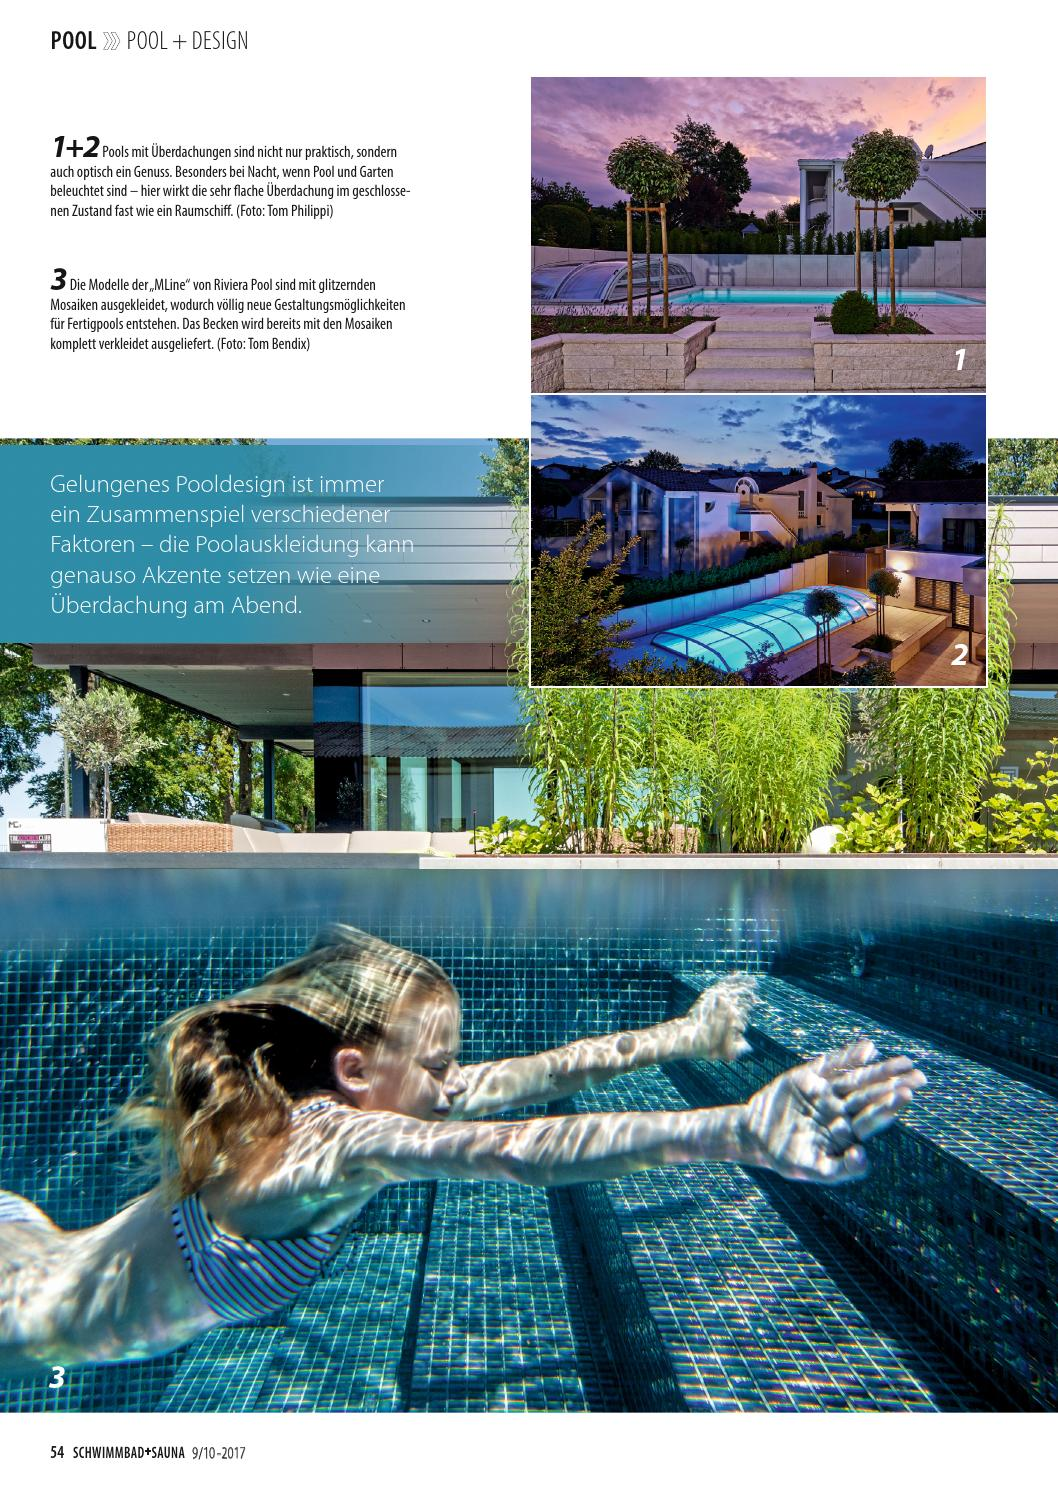 swimmingpool design ideen flachen, schwimmbader fur den garten - realitny.club, Design ideen